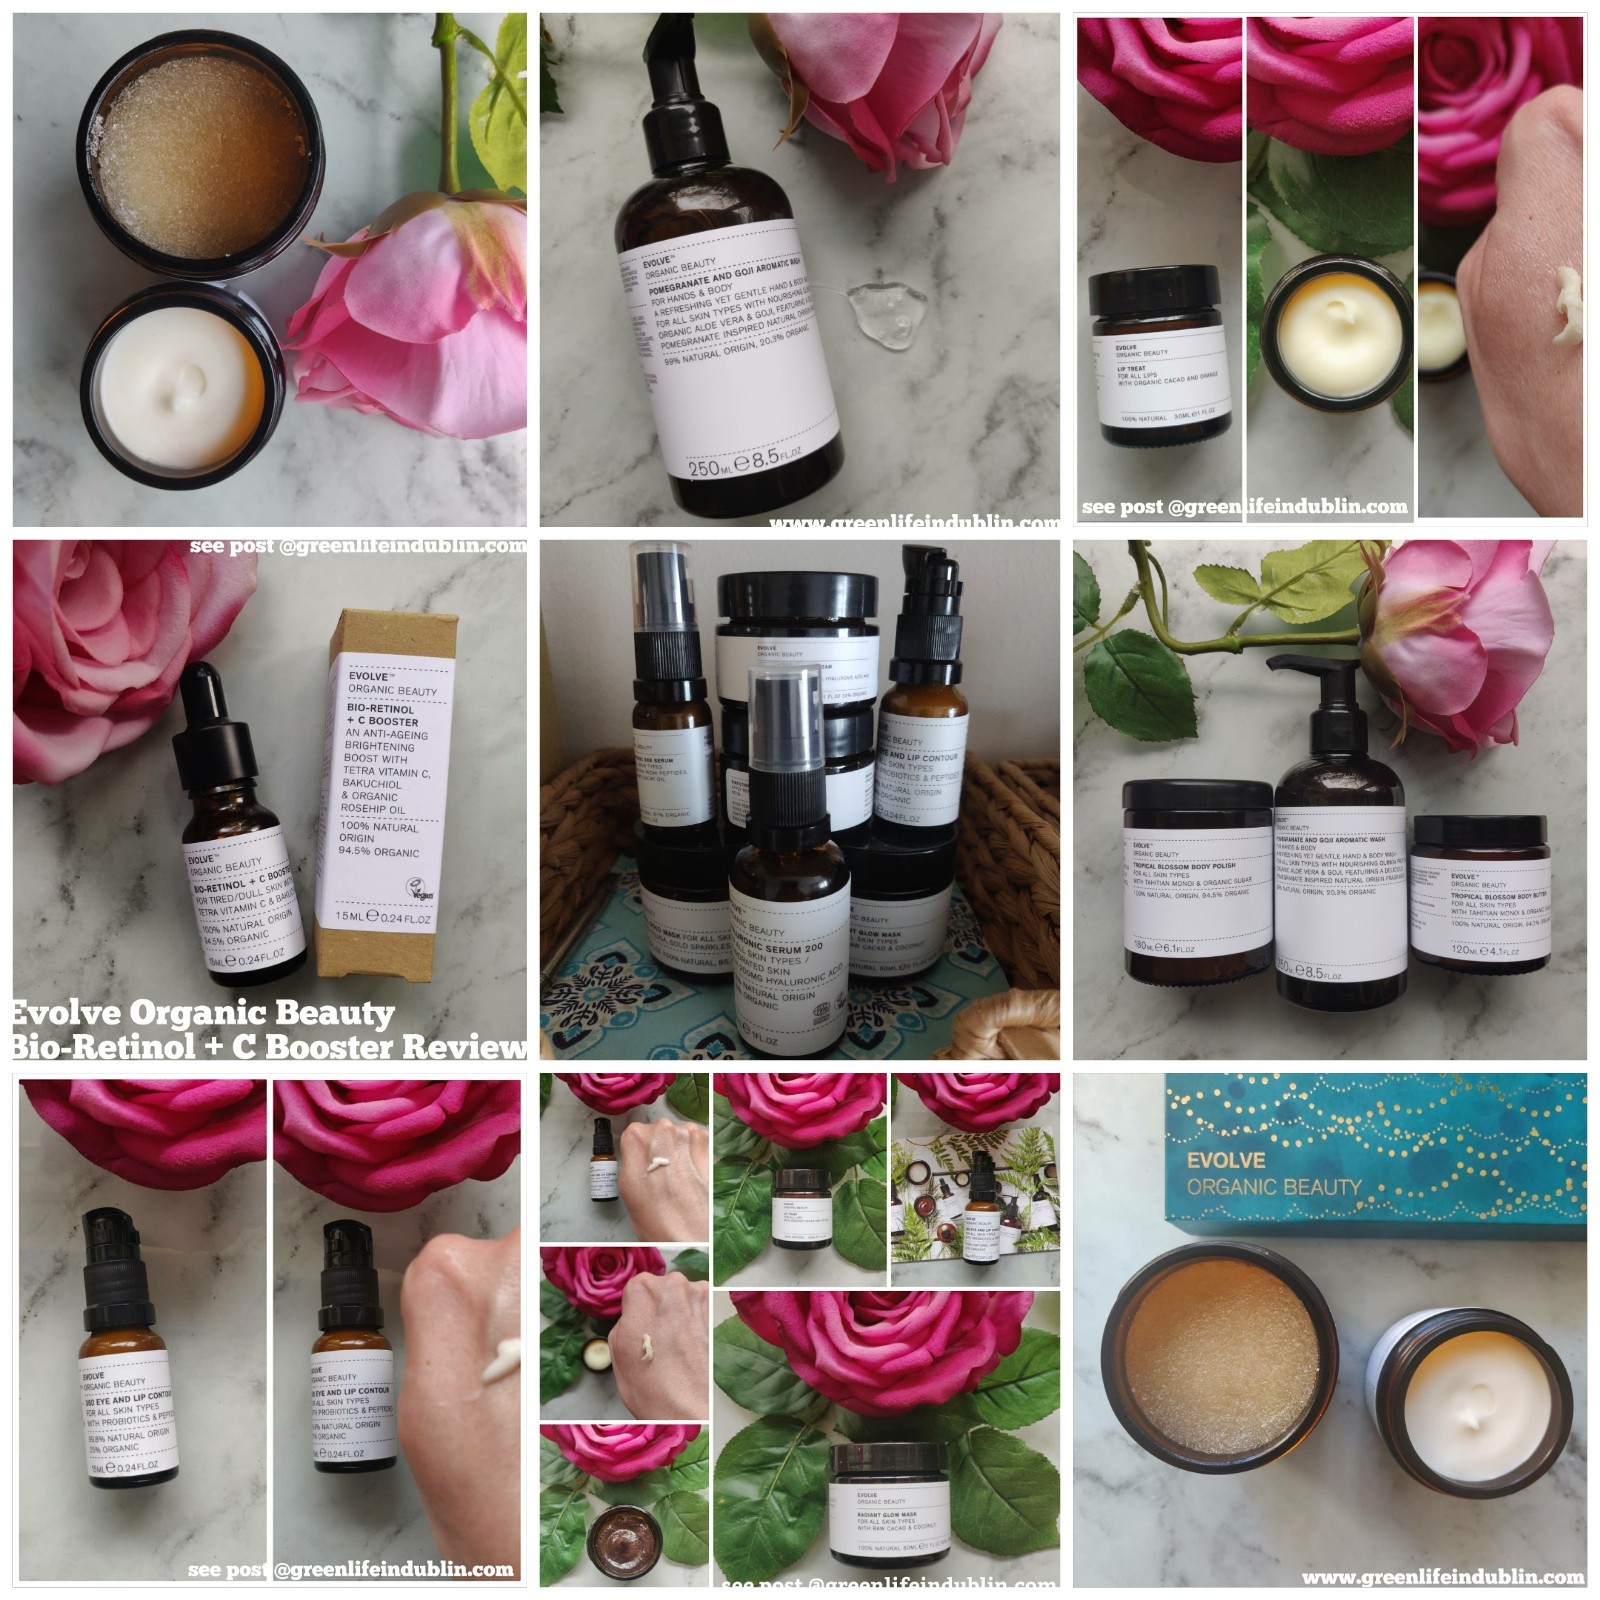 Evolve Organic Beauty Review - Green Life In Dublin